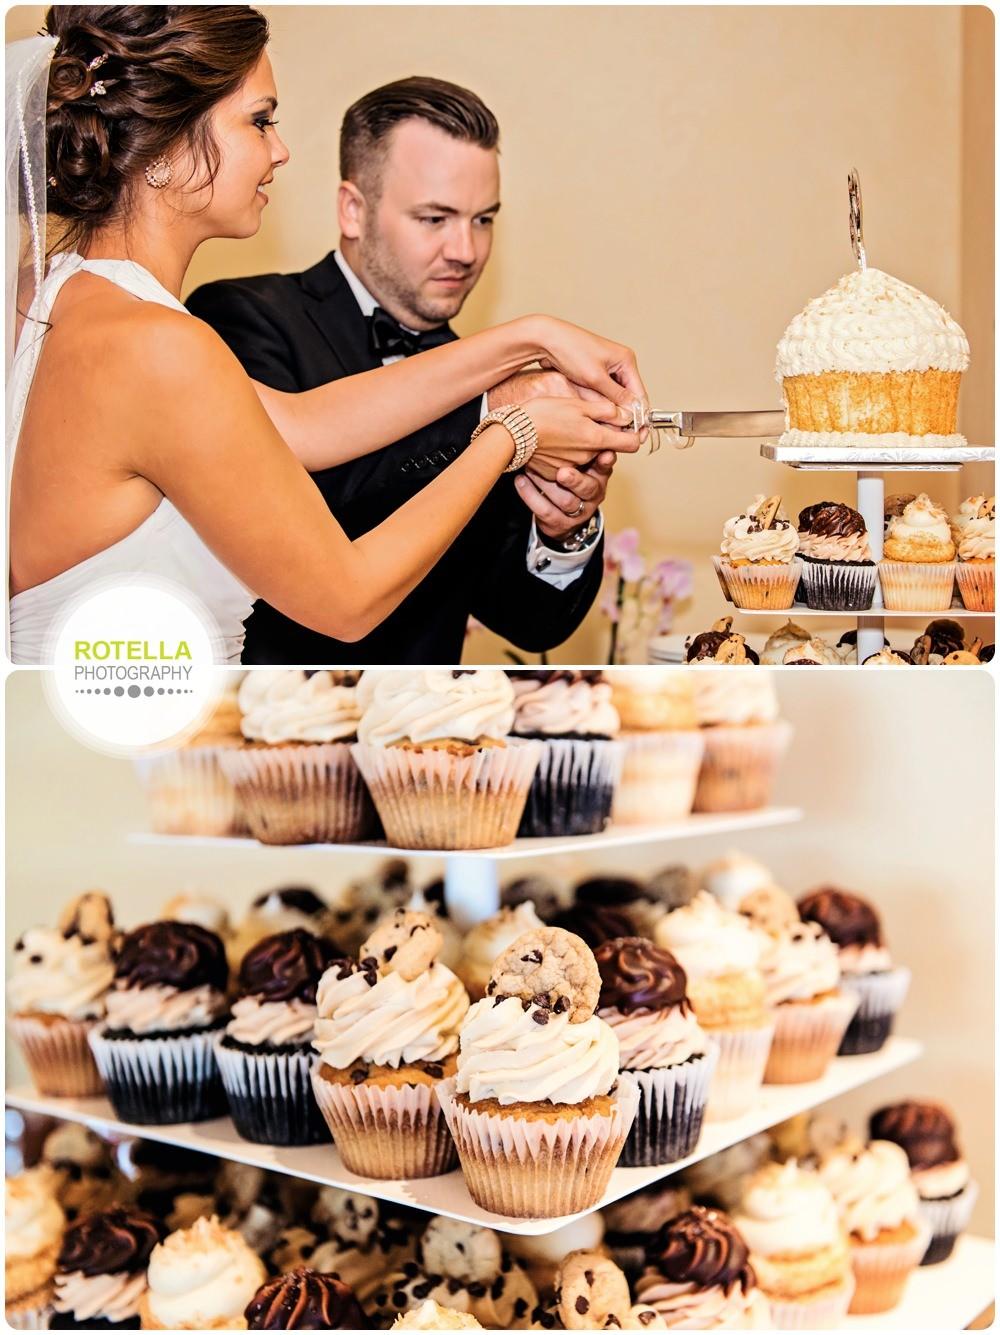 MELANIE-DEREK-MINNESOTA-WEDDING-PHOTOGRAPHY-ROTELLA-PHOTOGRAPHY_2015-16